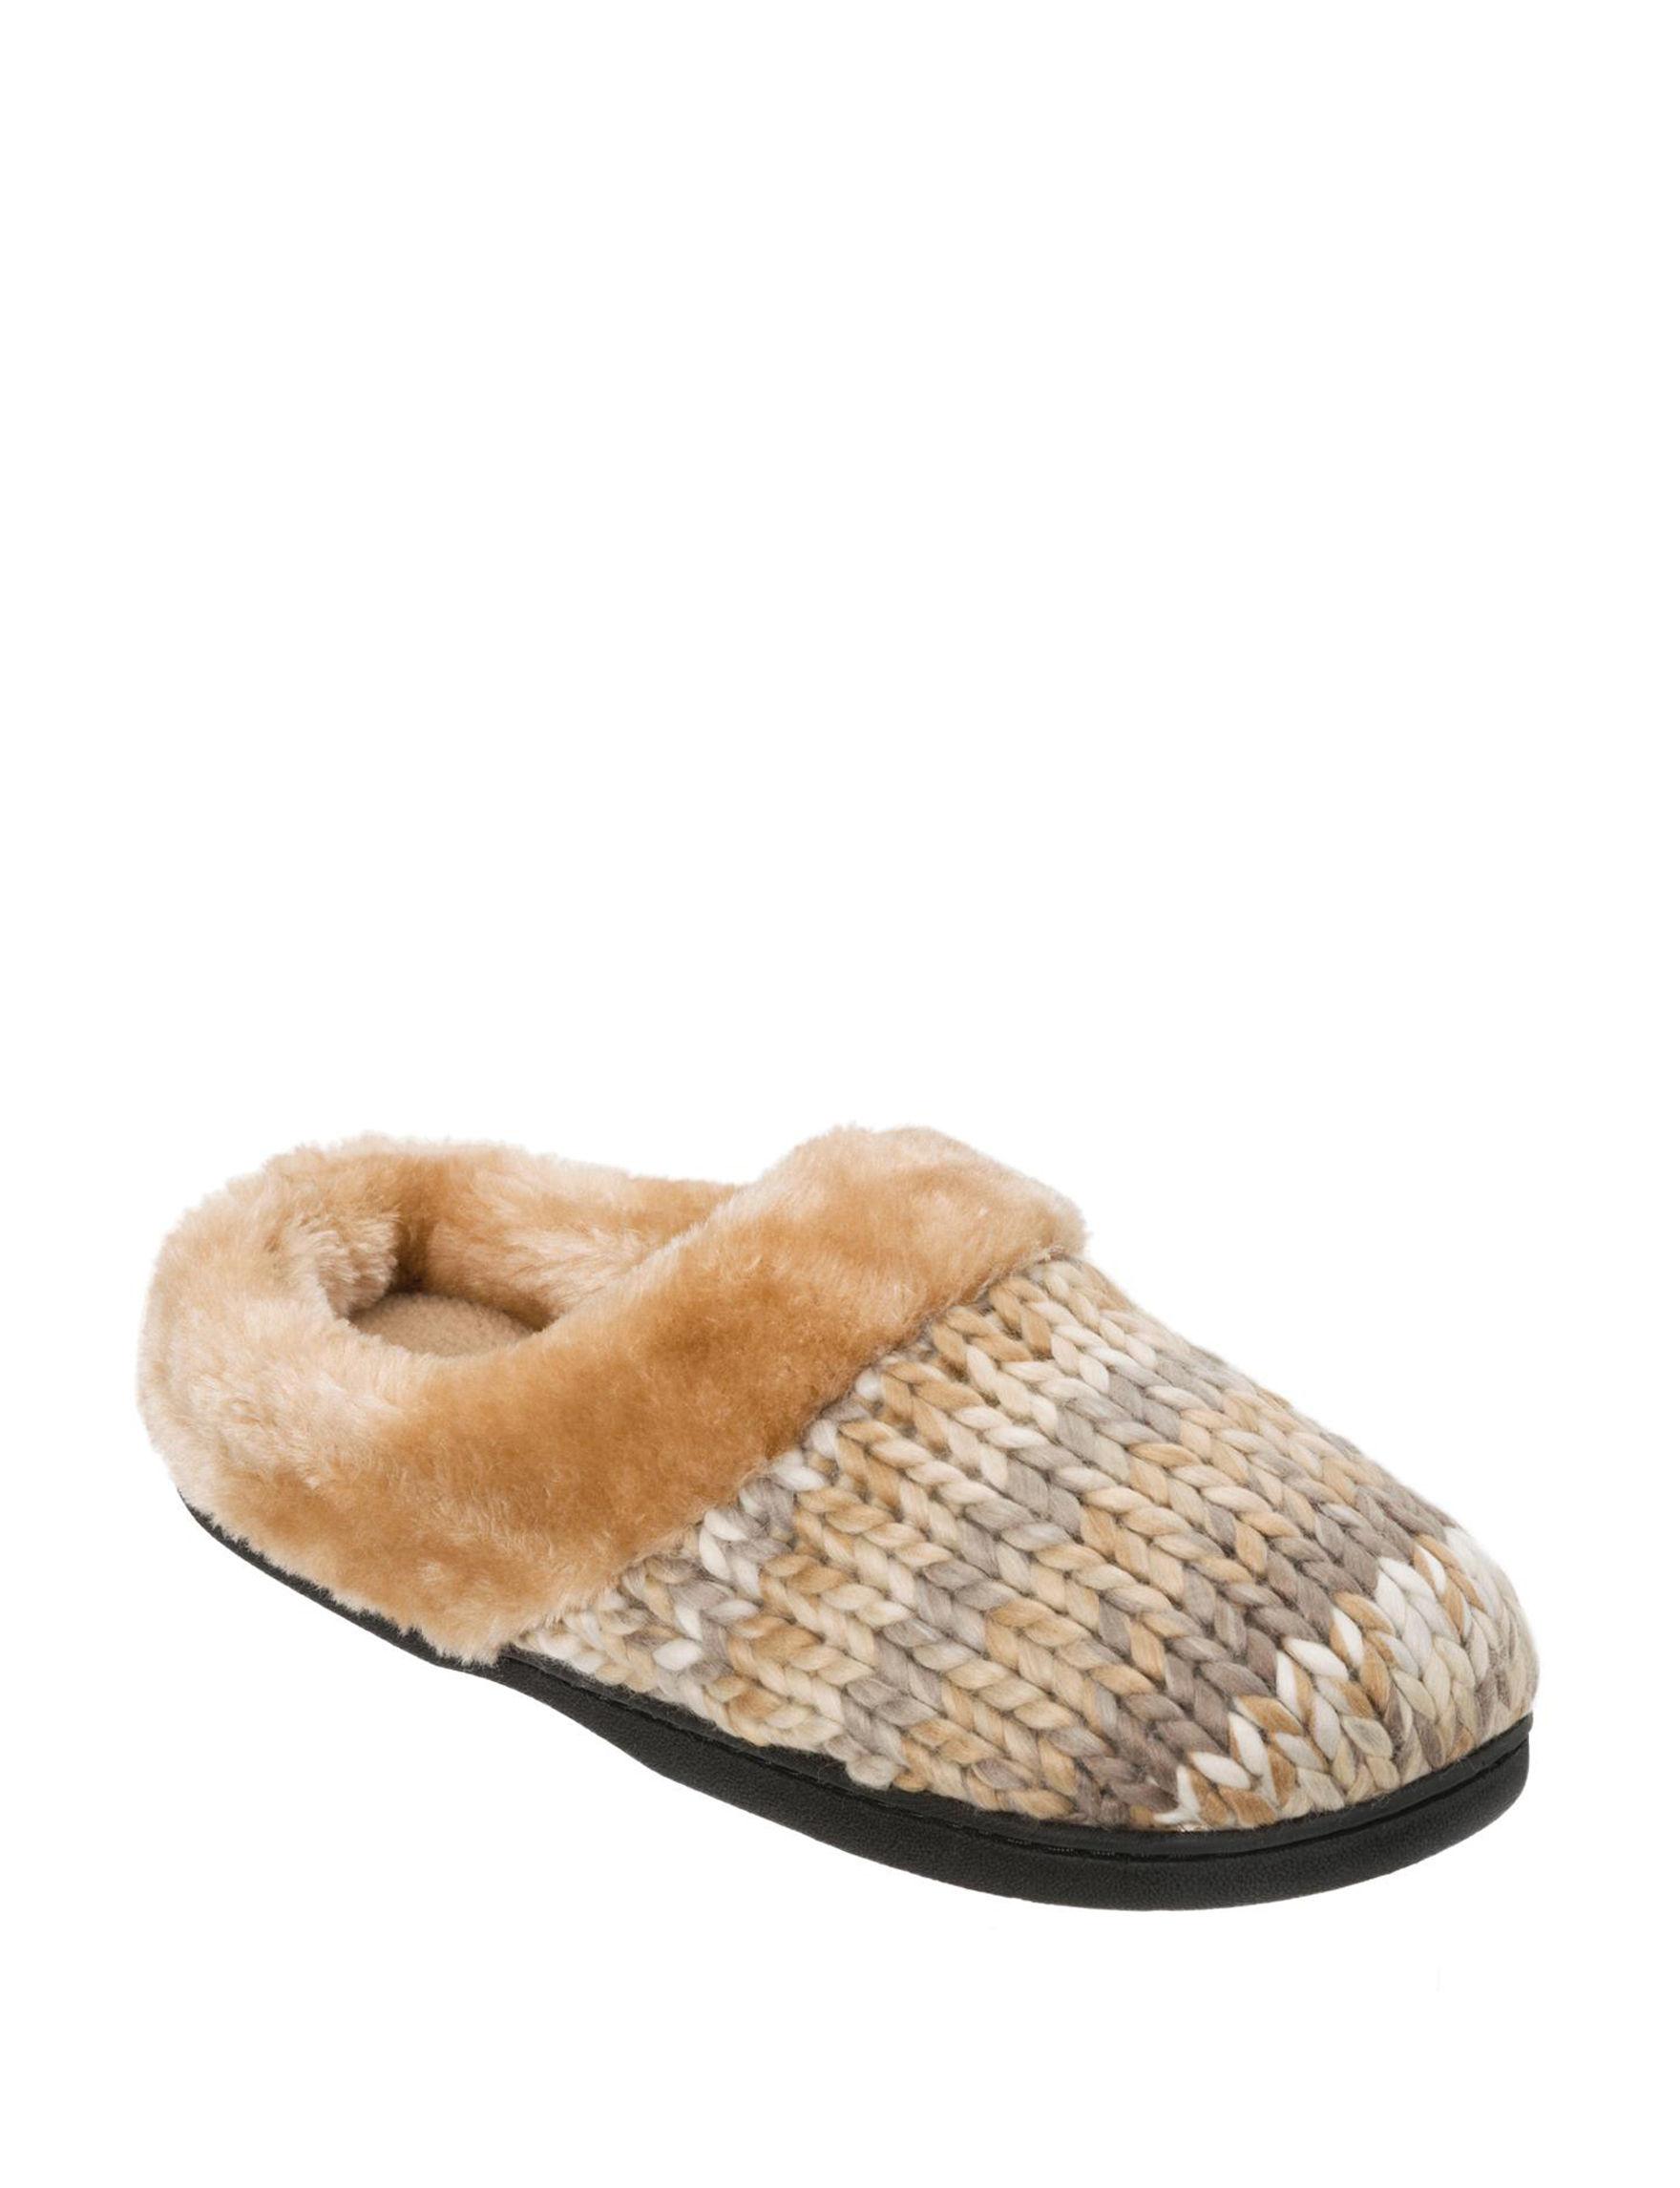 Dearfoams Desert Slipper Shoes